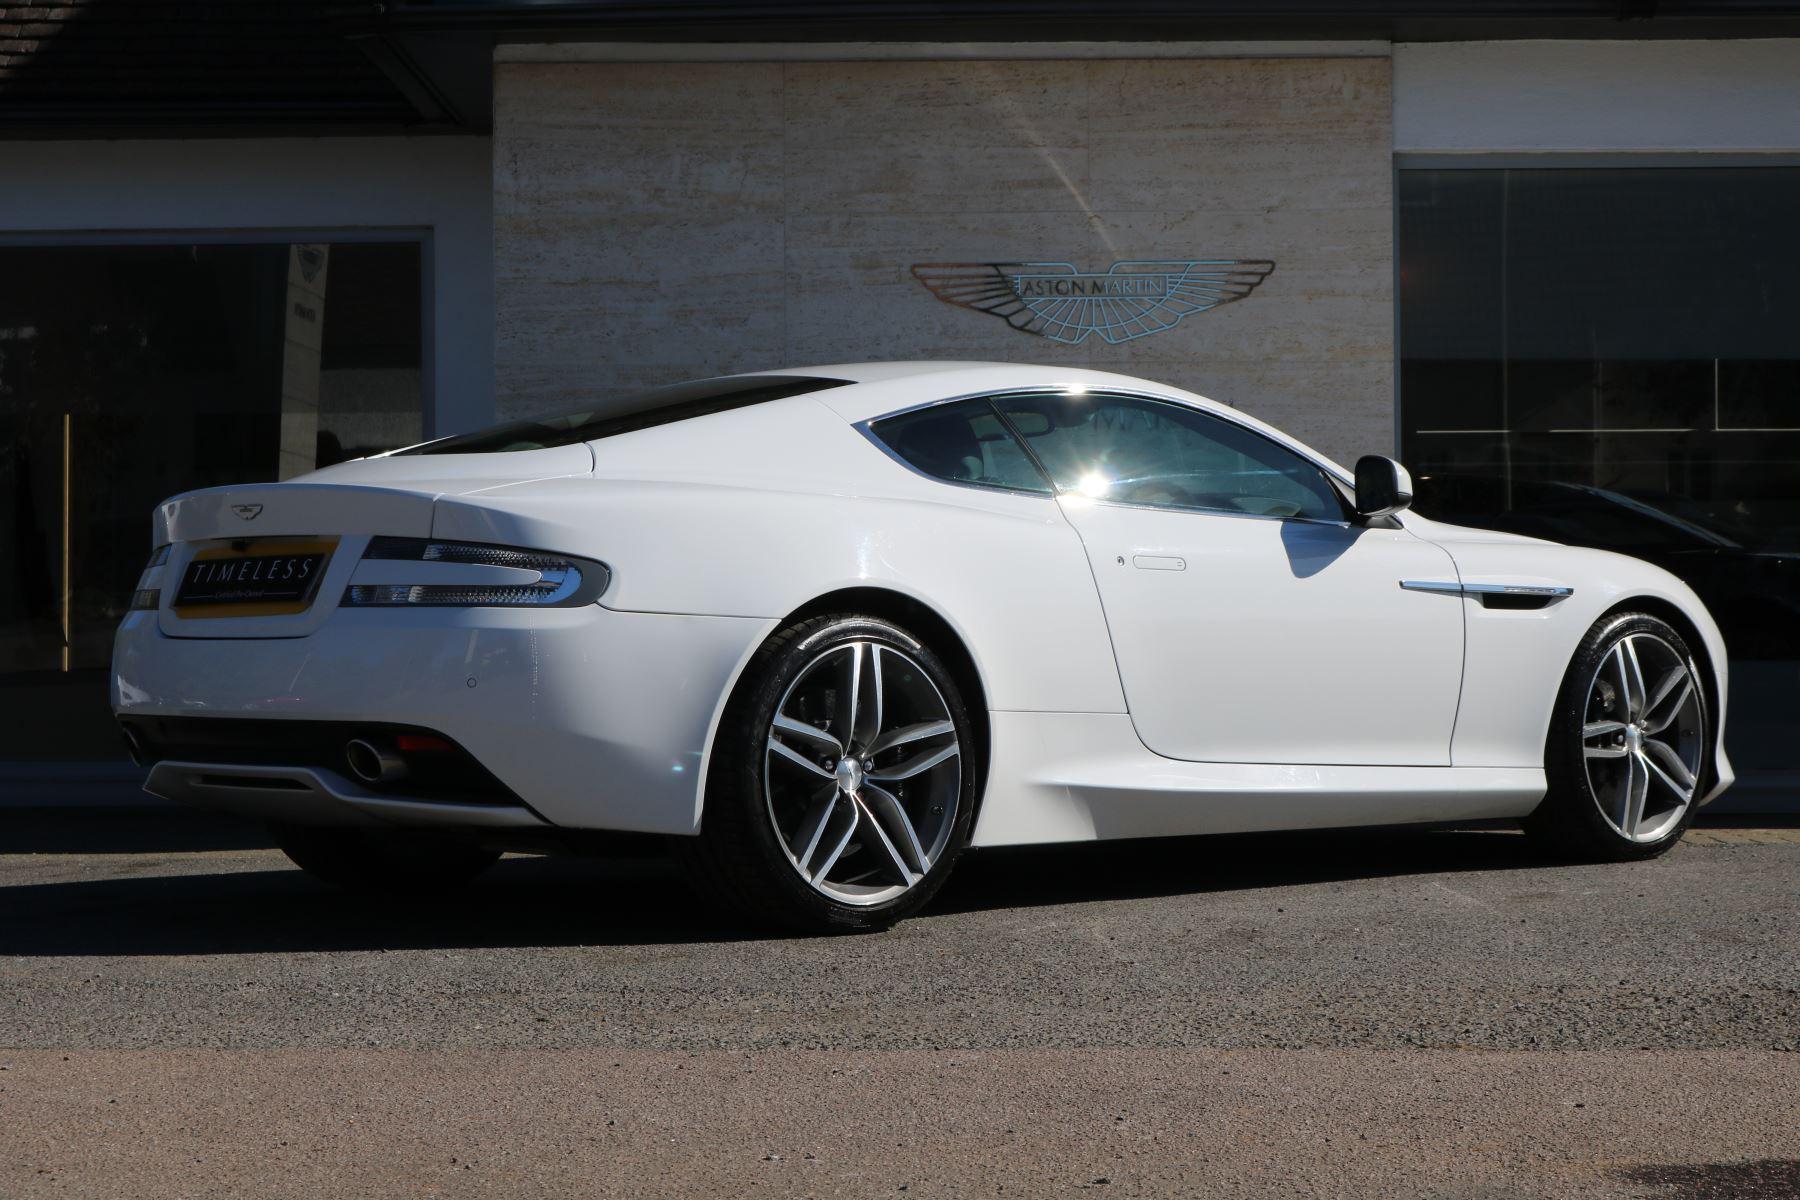 Aston Martin Virage V Dr Touchtronic Automatic Coupe - Aston martin virage coupe